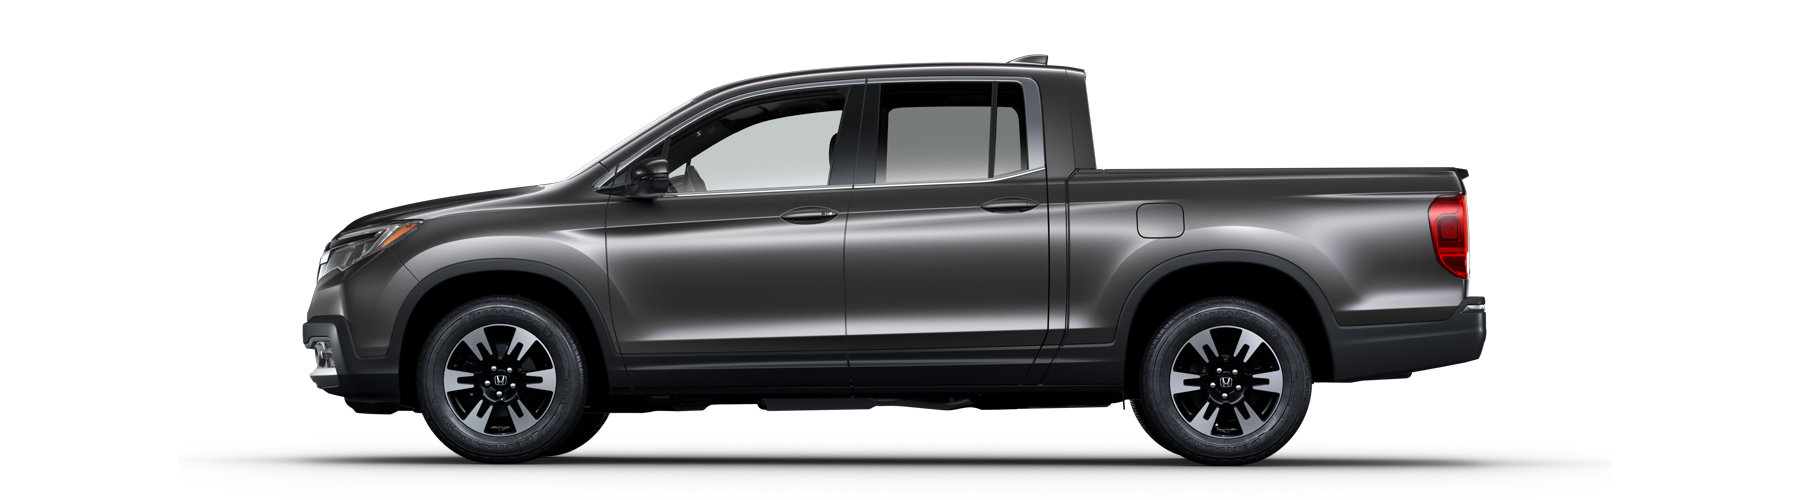 2018 Honda Ridgeline Side Profile